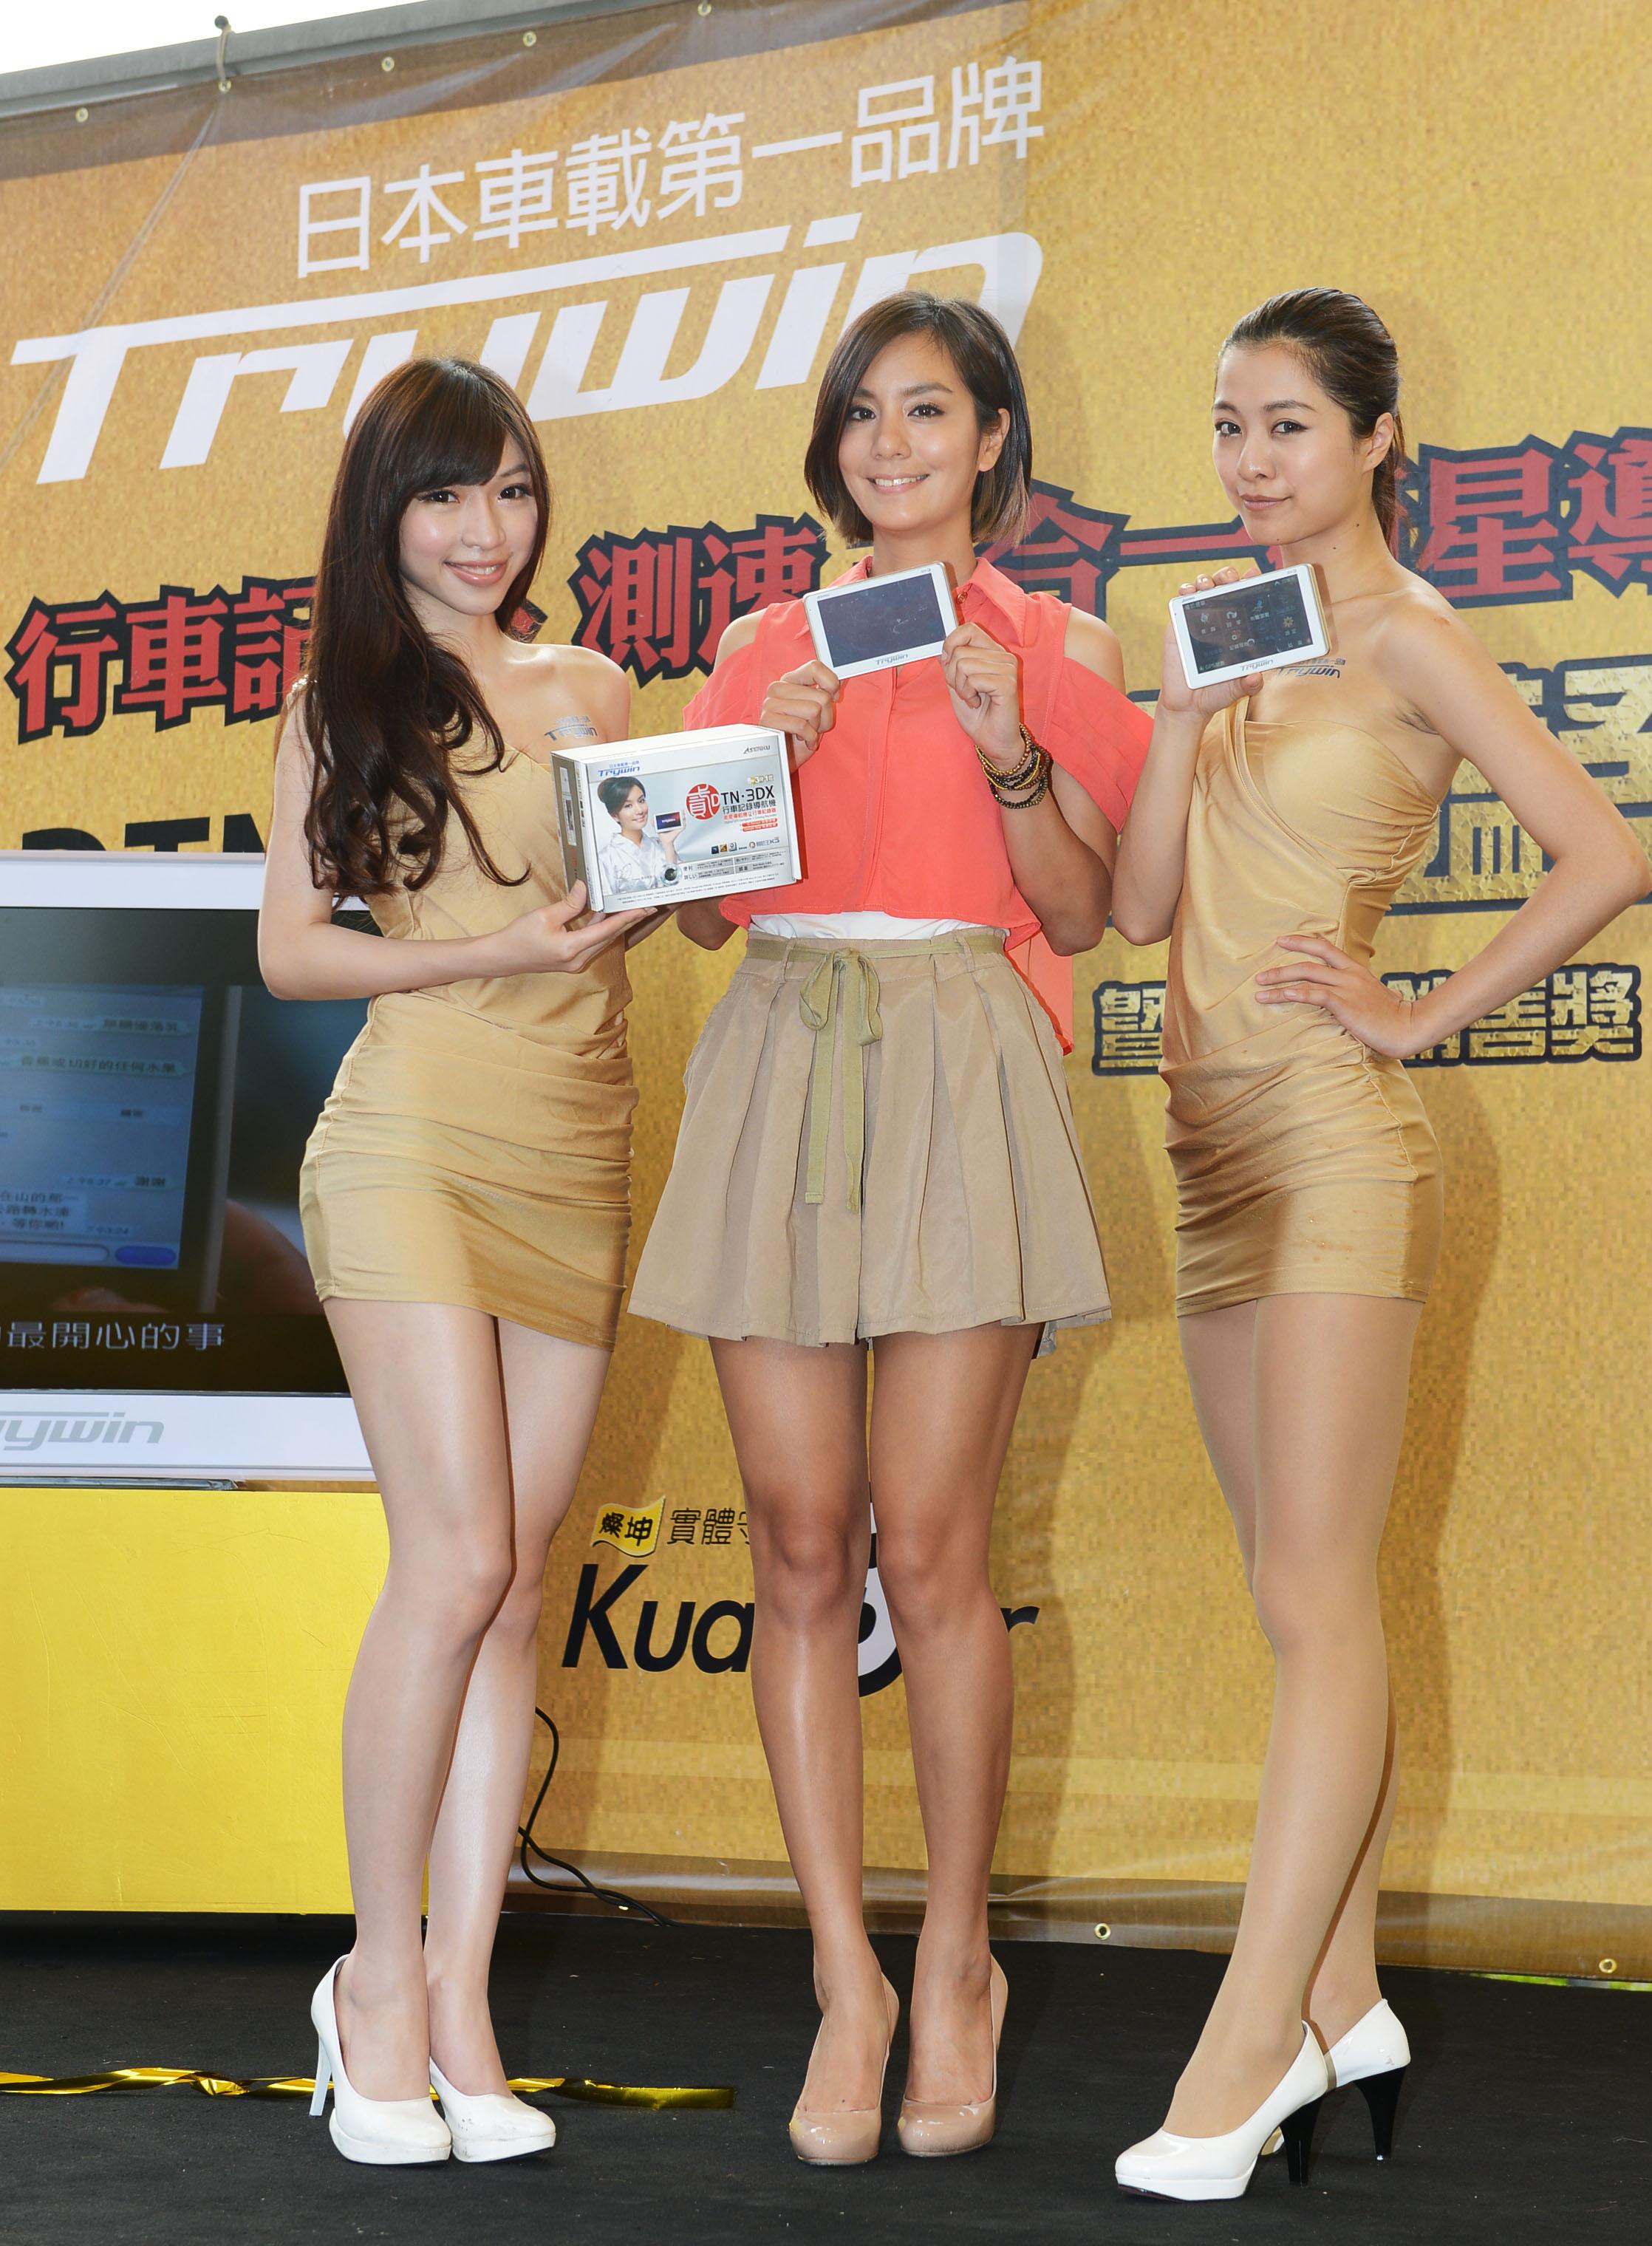 TrywinDTN-3DX(貳) 金奇機,金艷上市「全球首款 世界唯一 三機一體創新設計」